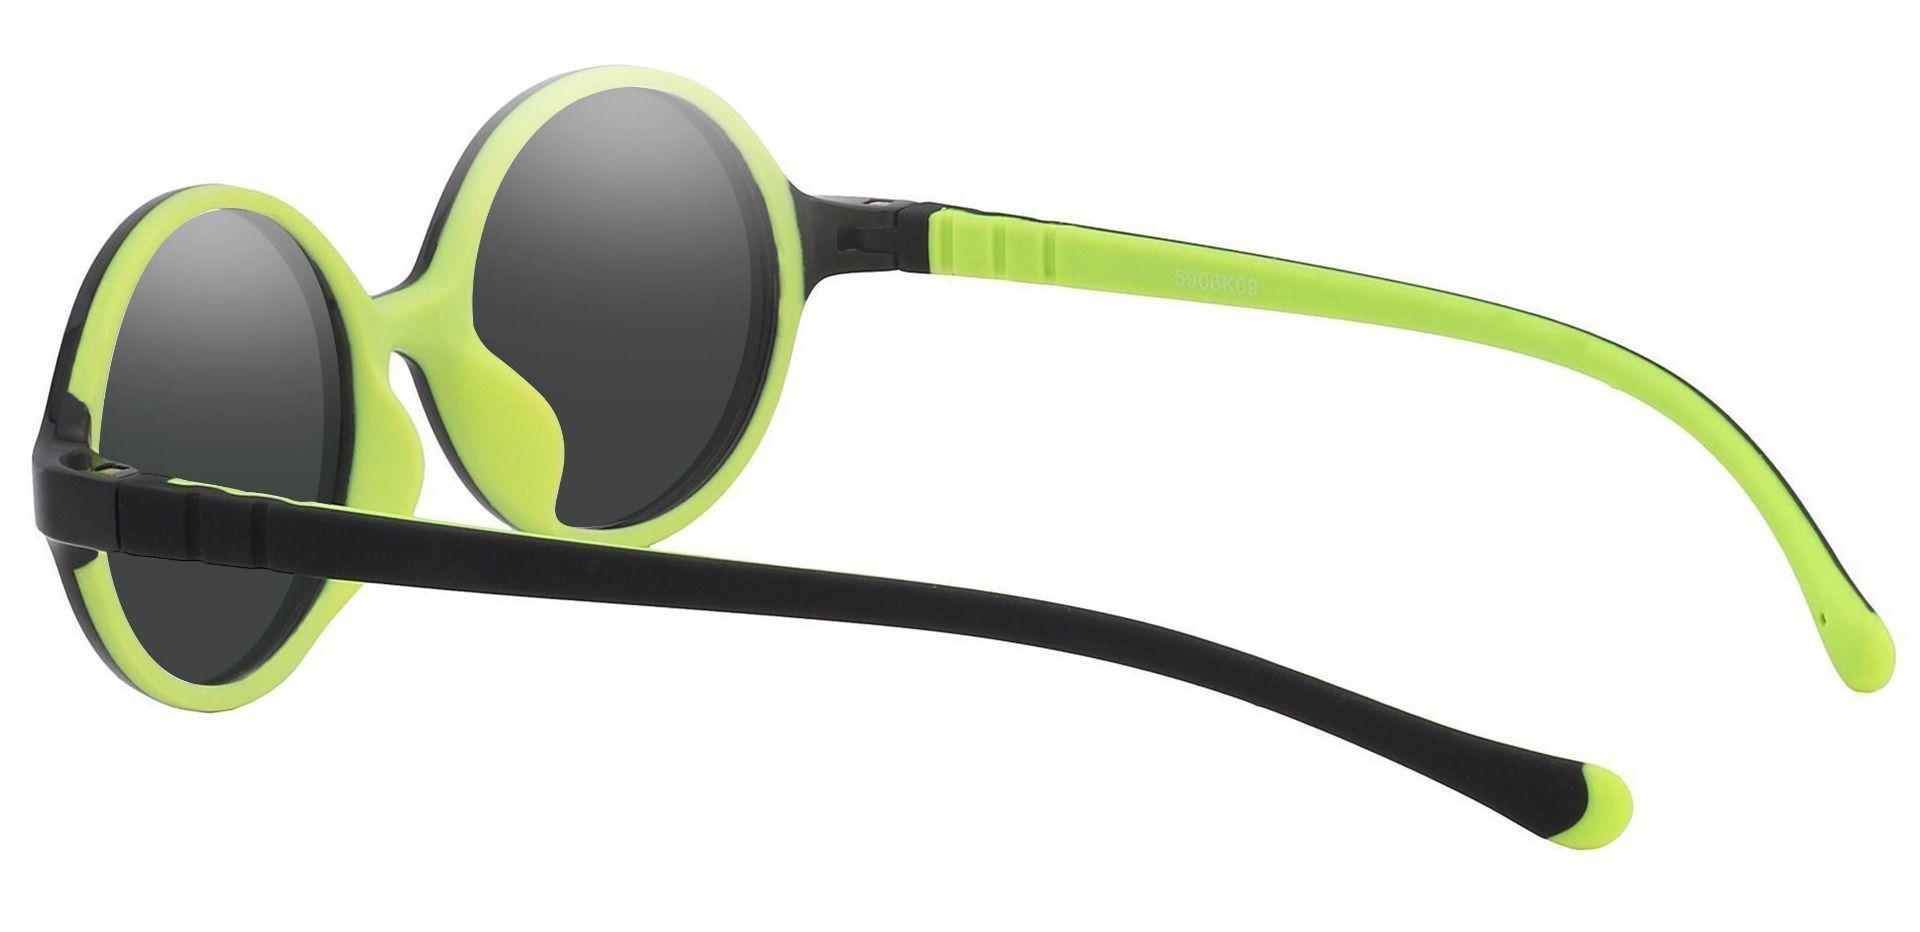 Dagwood Round Prescription Sunglasses - Black Frame With Gray Lenses